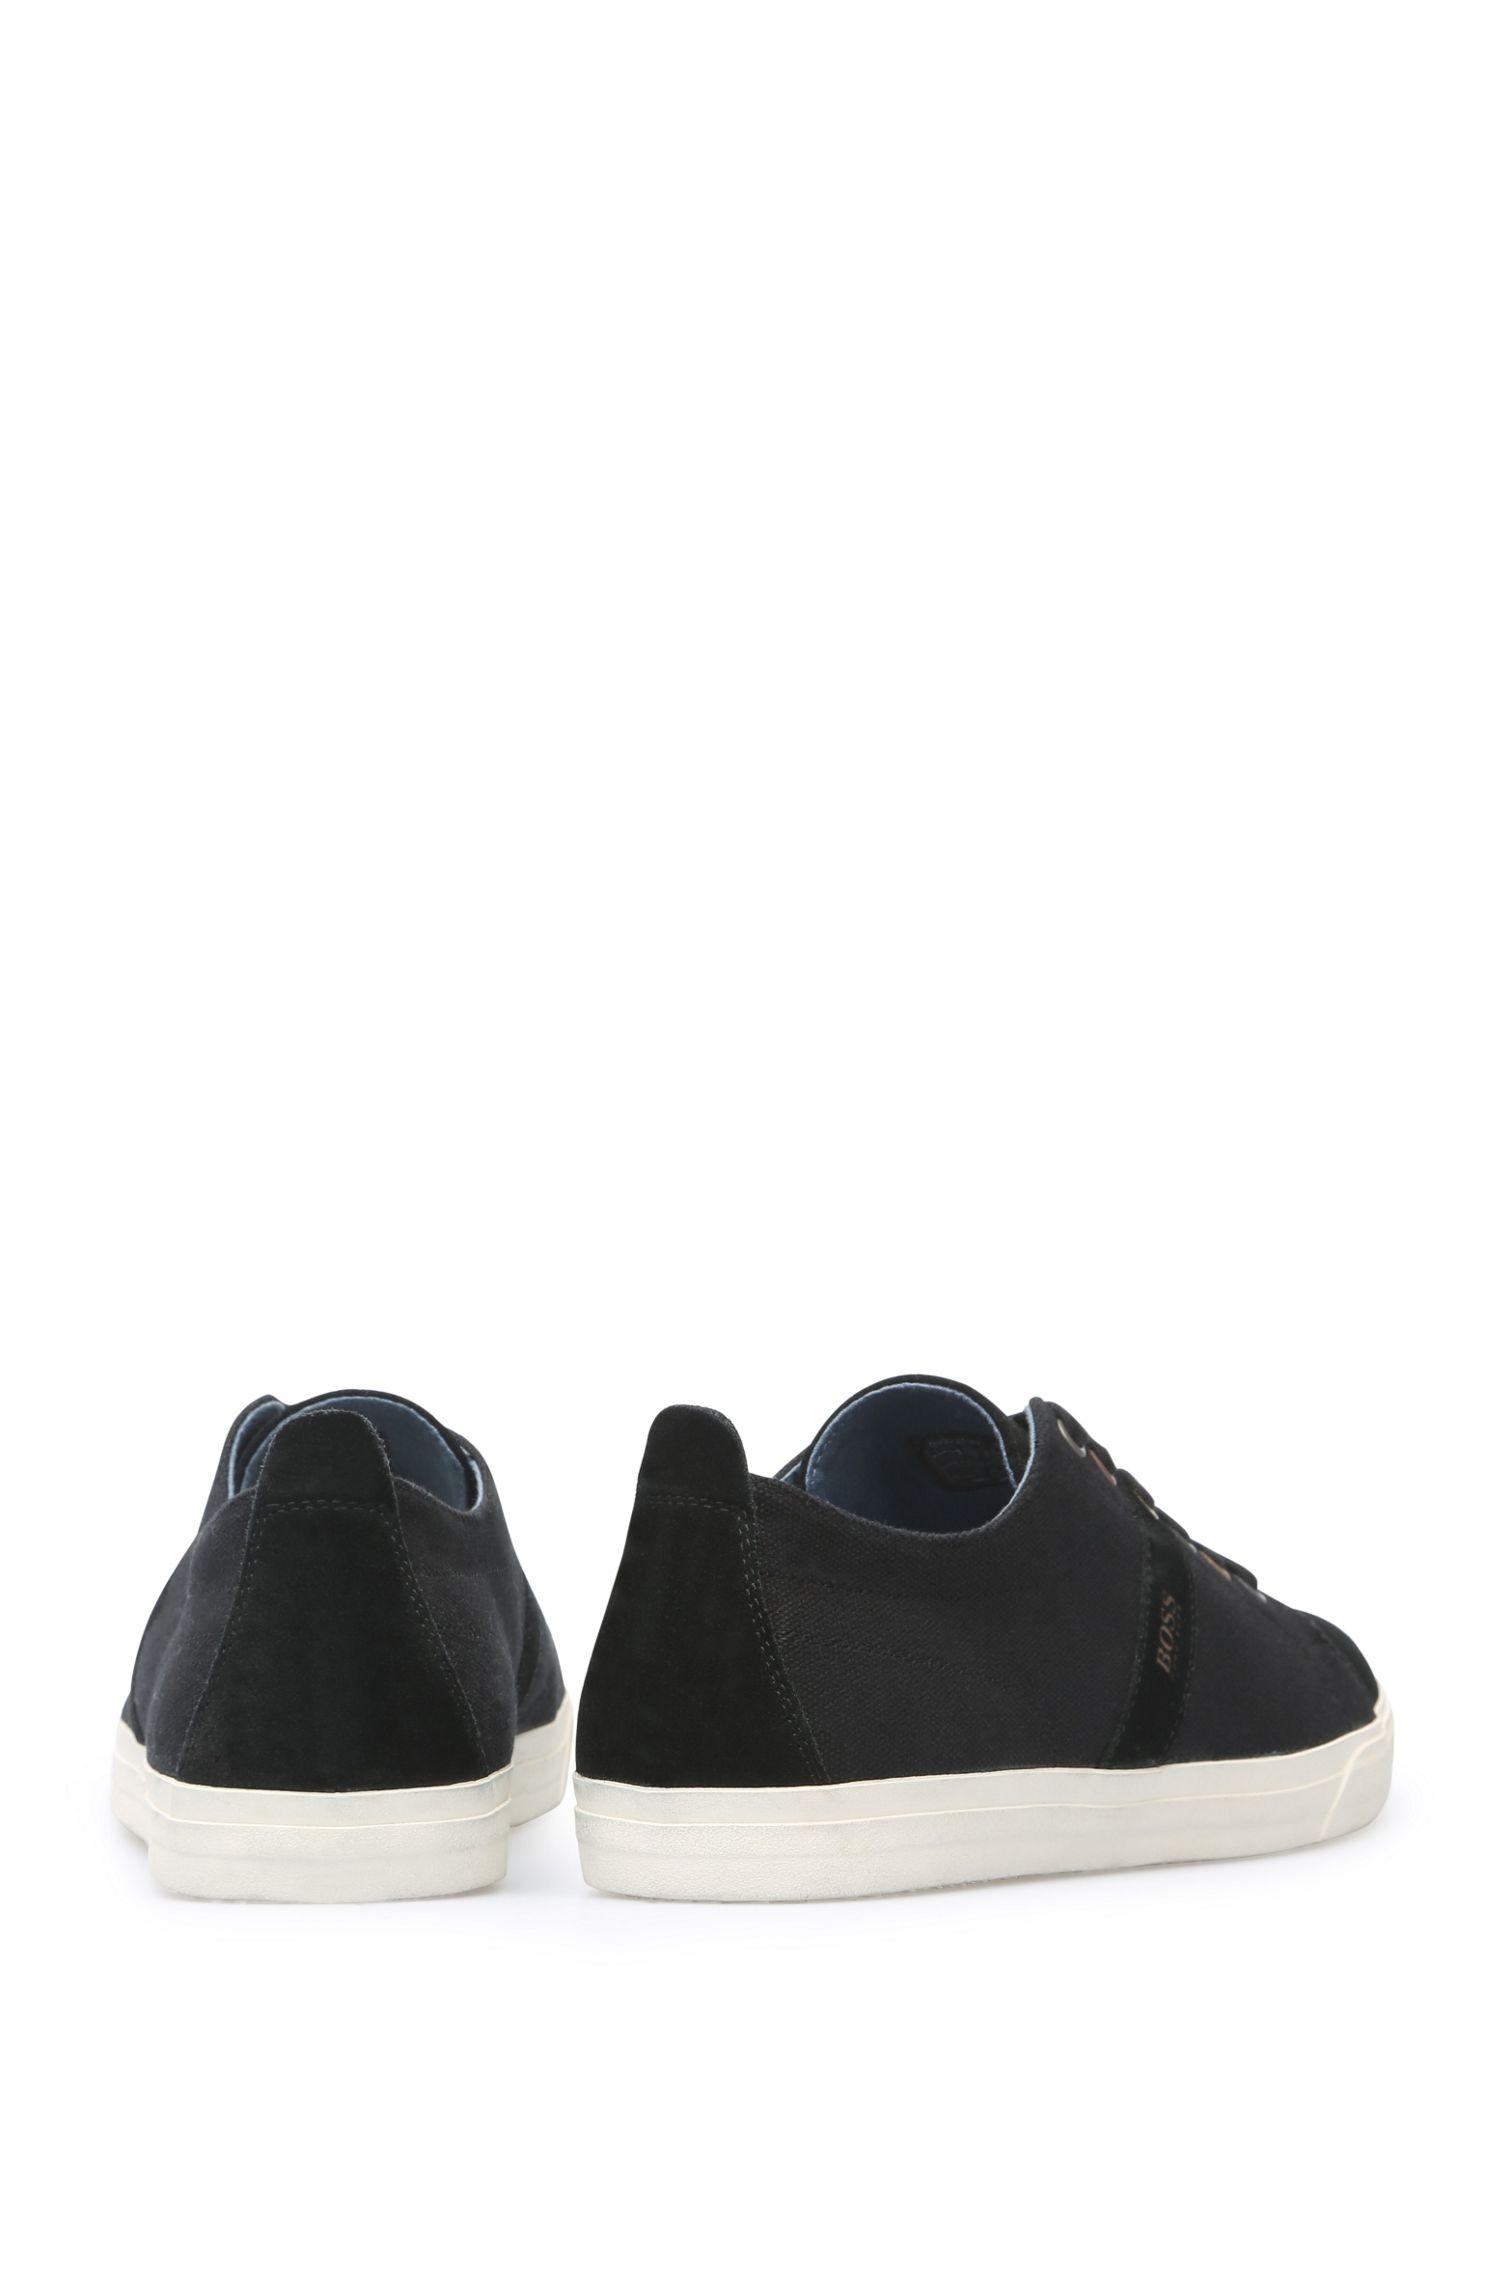 Sneakers aus Veloursleder und Textil mit Kontrastsohle: ´Bushwick_Tenn_cv`